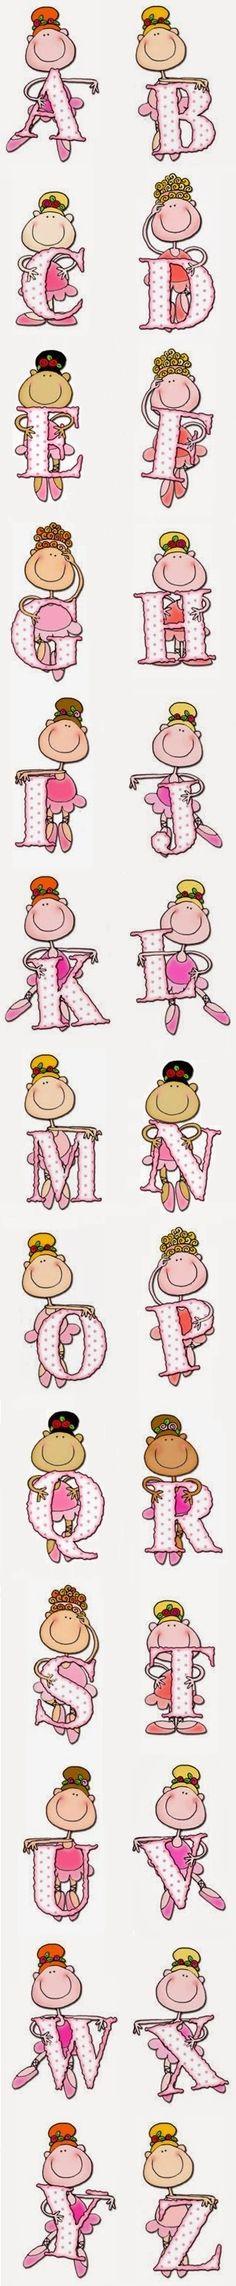 Alfabeto Bailarinas                                                       …